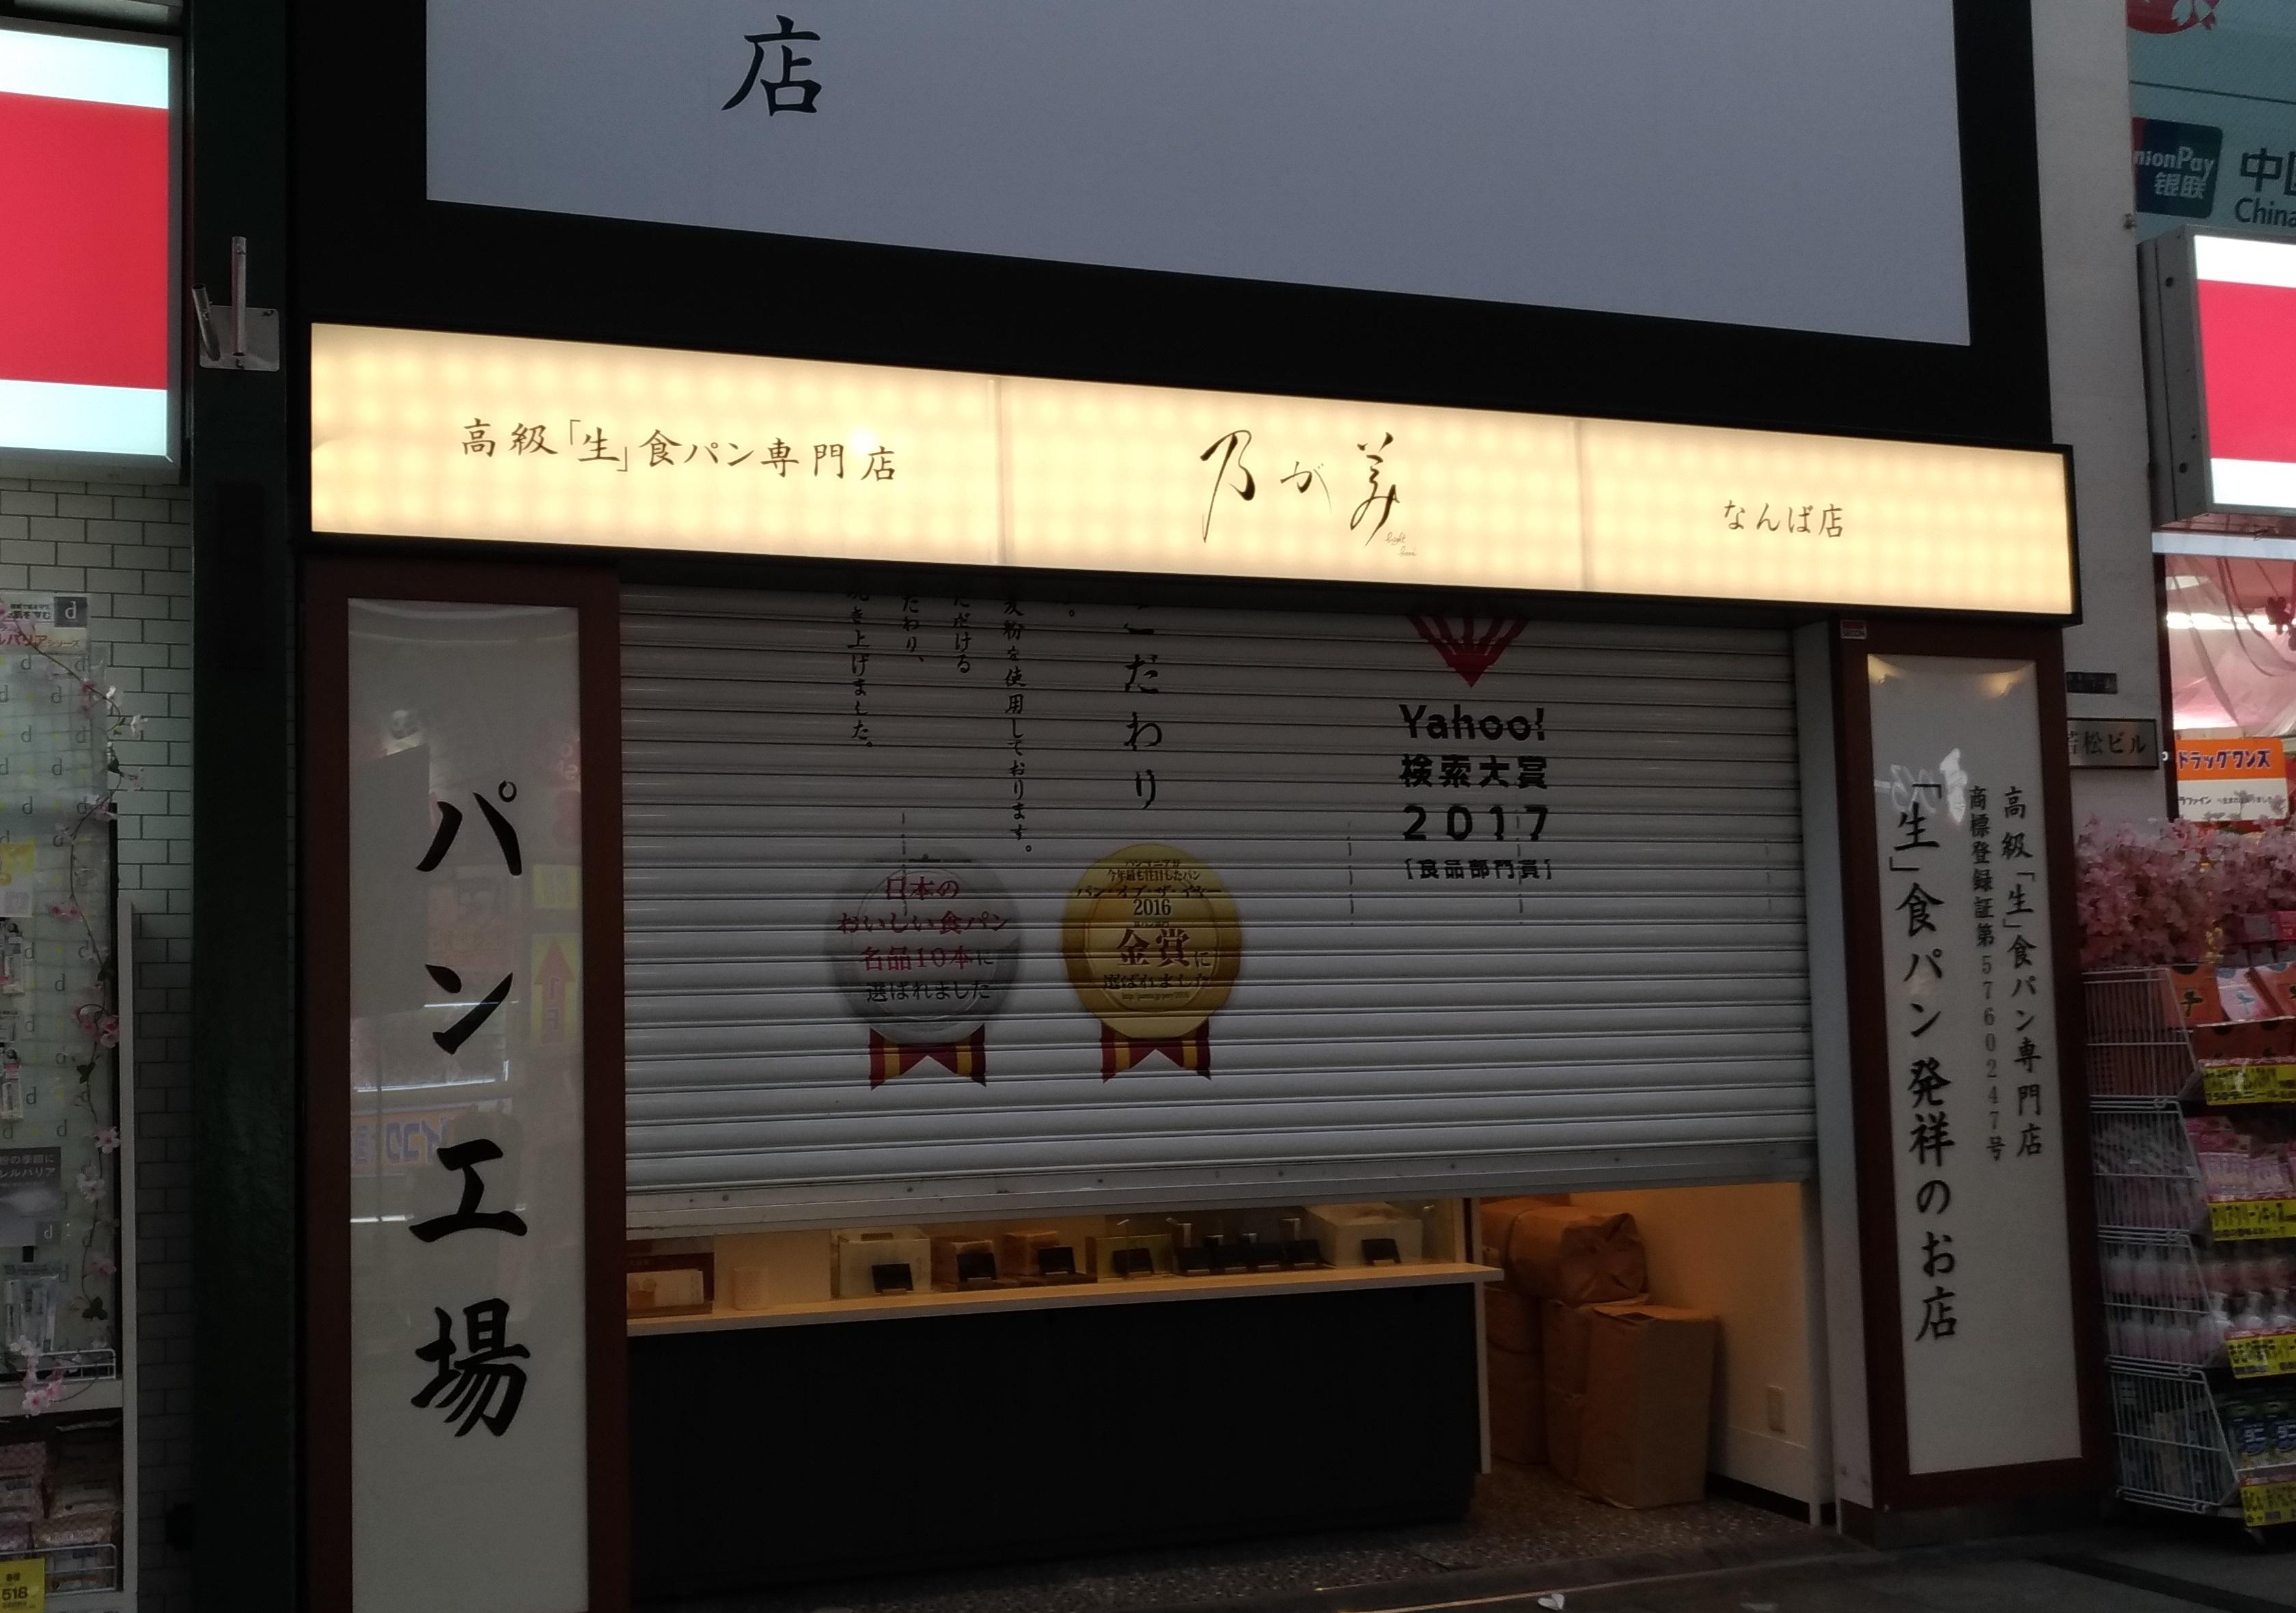 osaka_namba_shokupan2.jpg